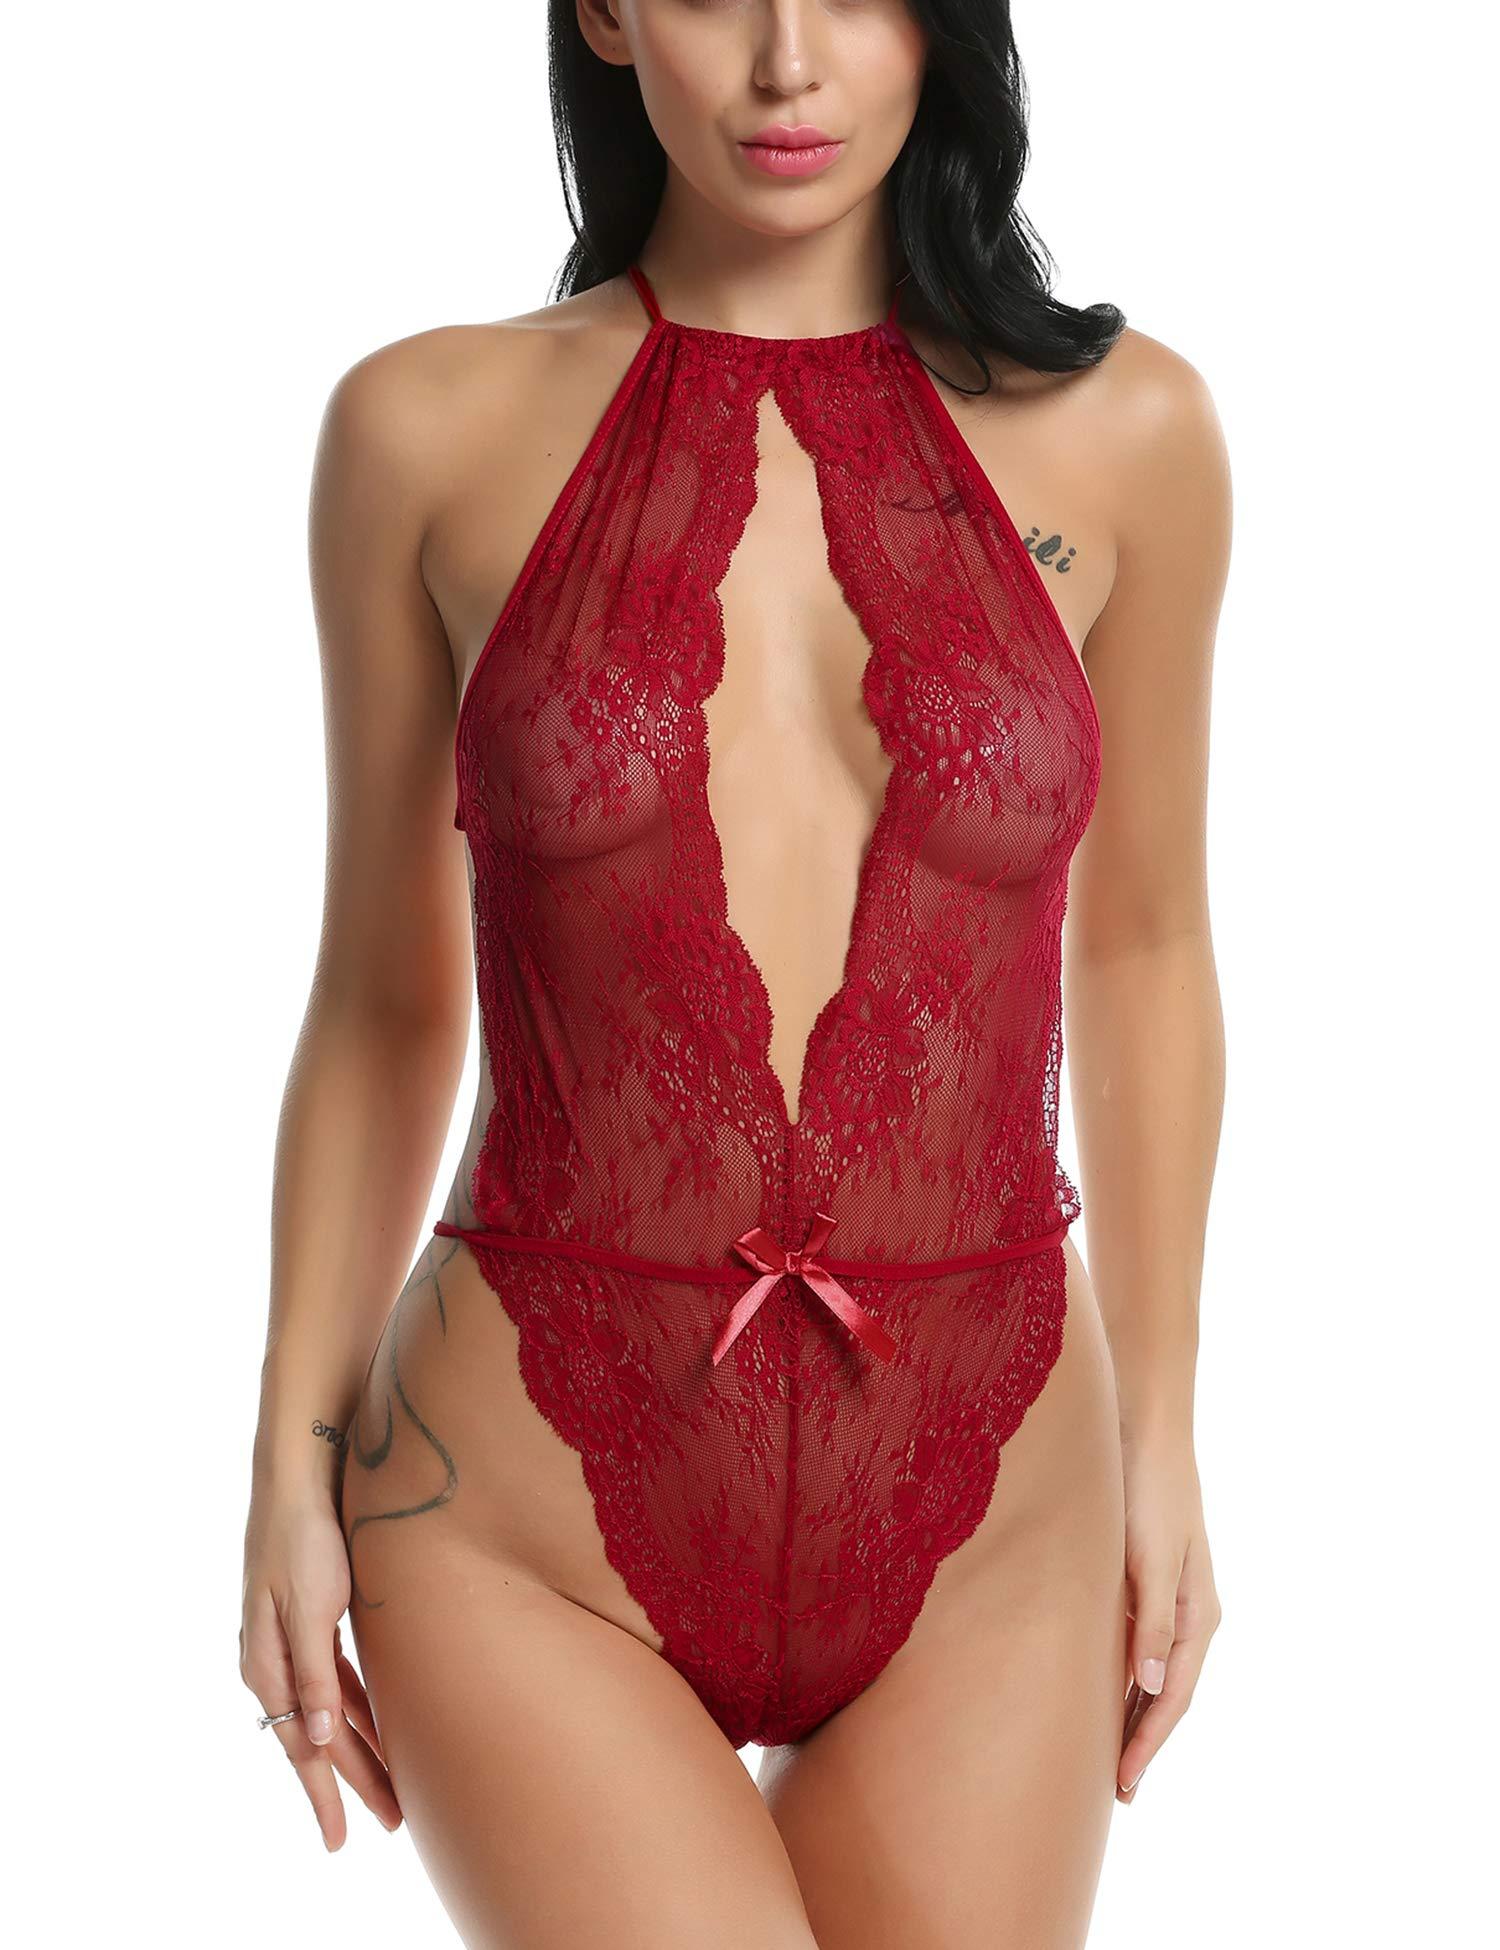 Avidlove Lingerie for Women Teddy One Piece Lace Babydoll Bodysuit